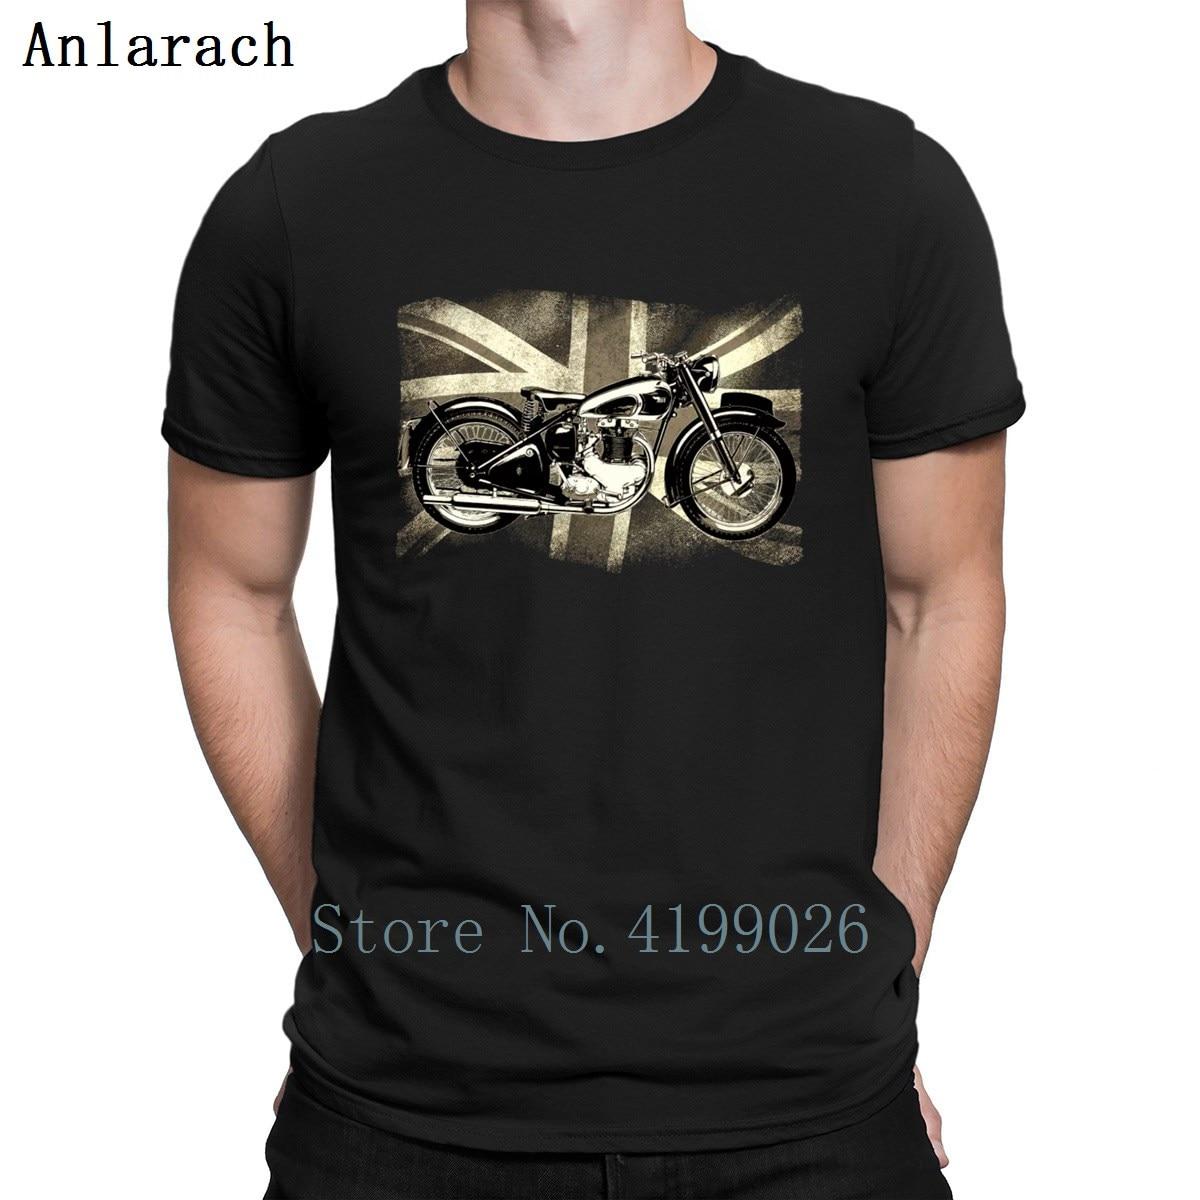 Hot_Bsa_Retro britannique classique icône Patjila2 t-shirts photos printemps hommes moto graphique t-shirt Streetwear Biker hauts